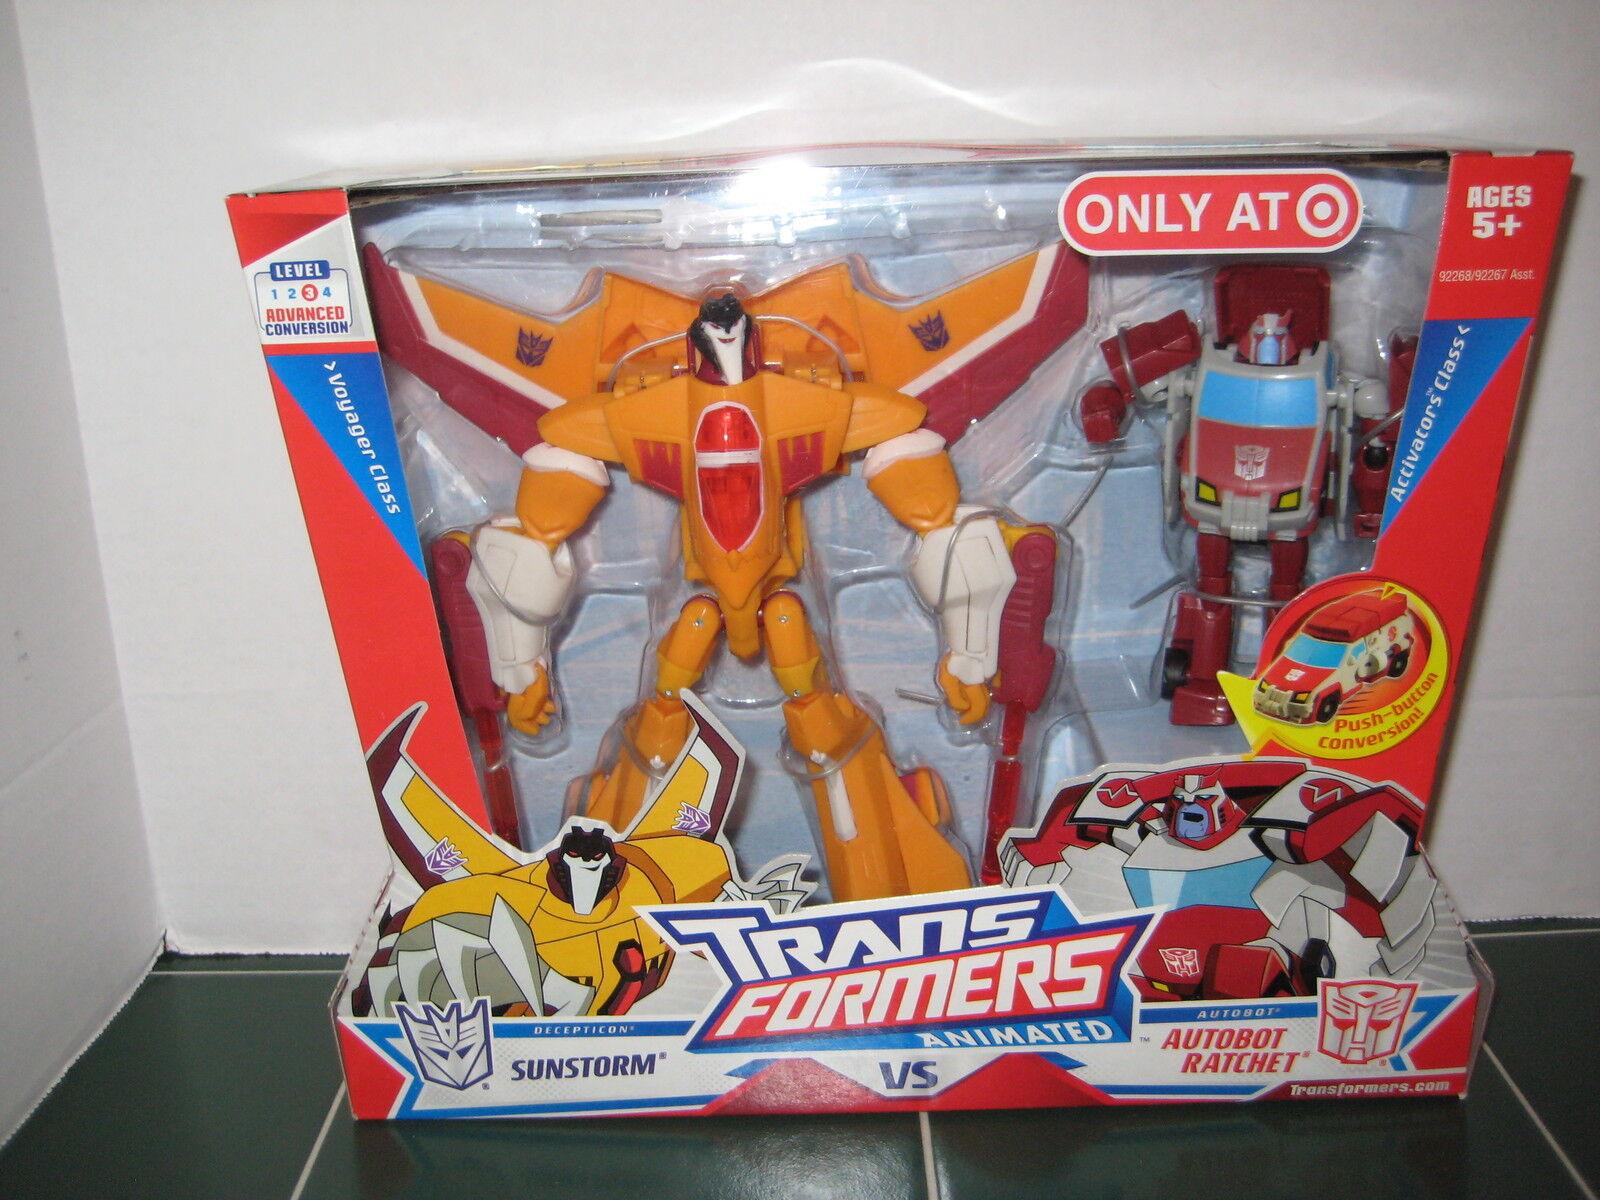 Transformers Animated Exclusive Sunstorm vs Autobot Ratchet Level 3